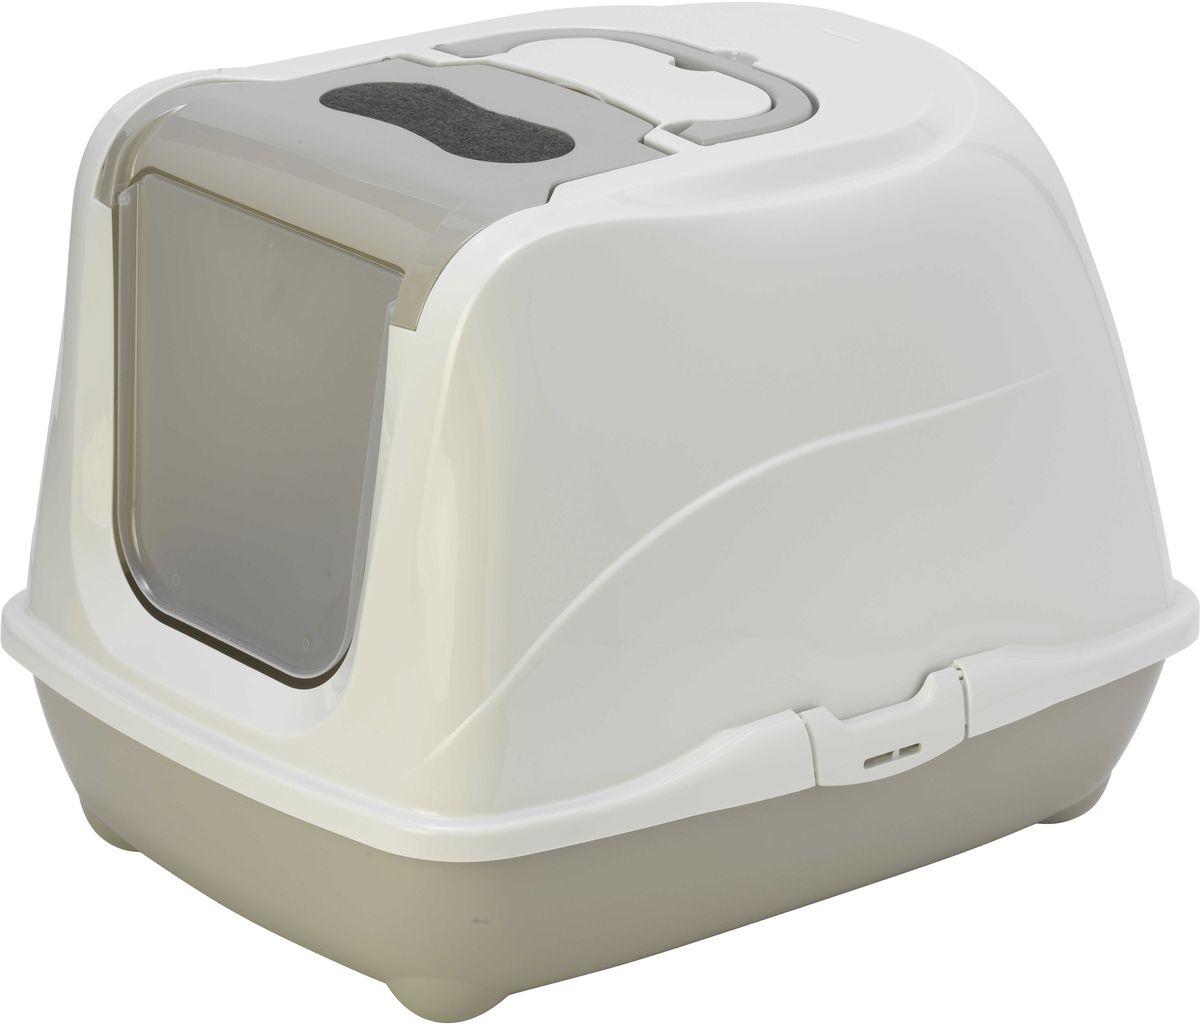 Туалет закрытый Moderna Flip Cat, для больших кошек, цвет: светло-серый, 58 х 45 х 42 см14C240330